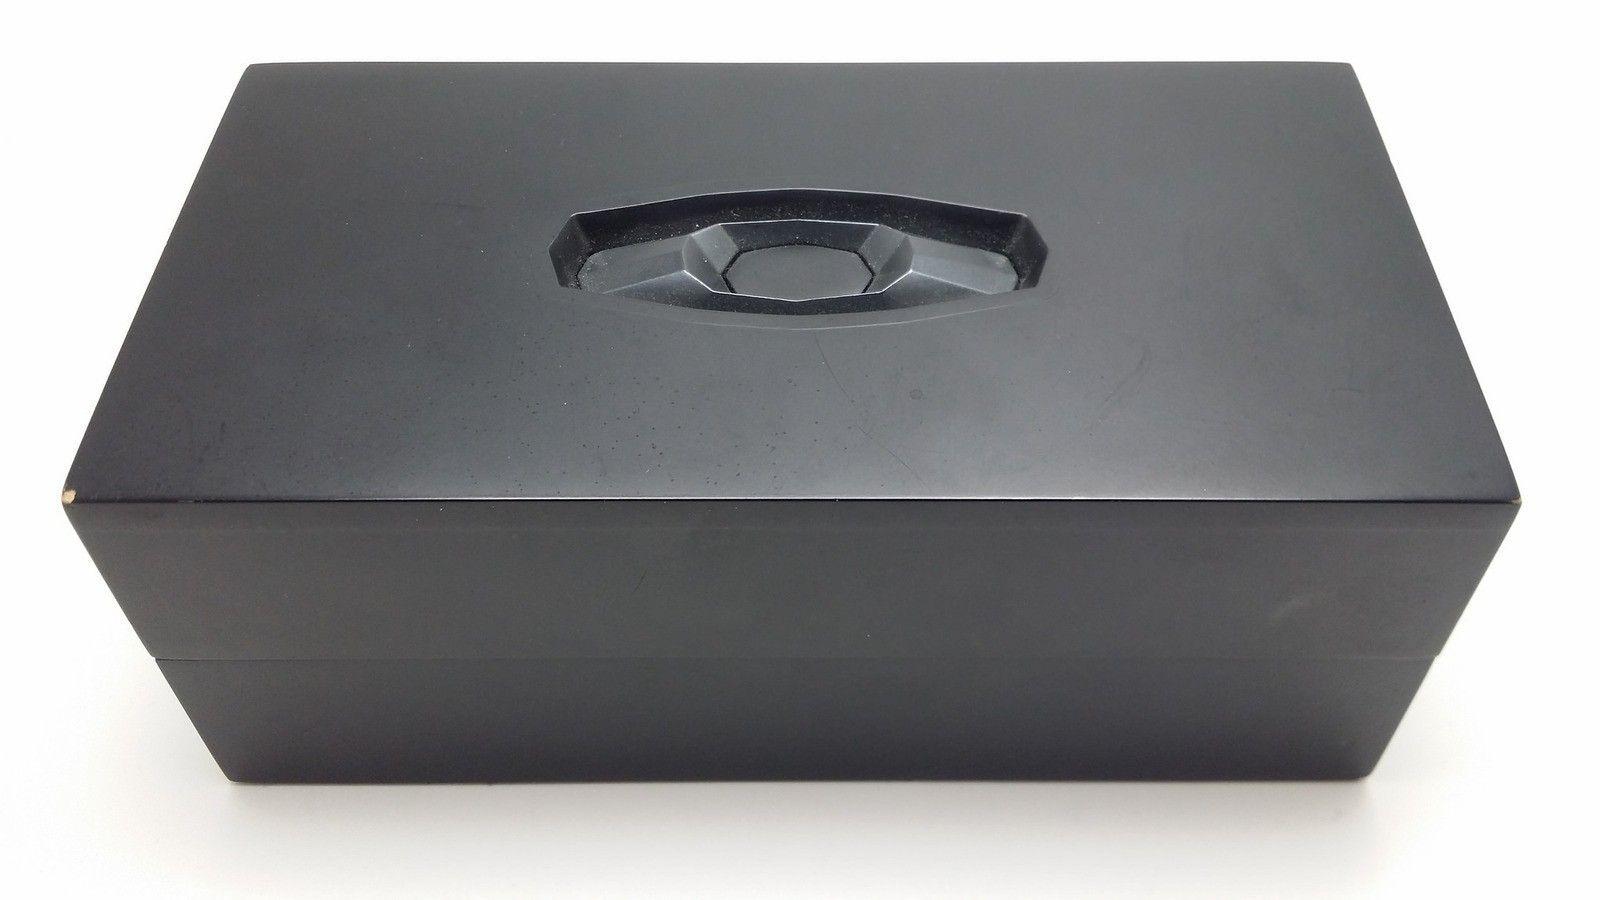 $OLD PB1 Matte/Ti  03-303 Complete Elite Bag Vault New blah blah... - 16146726624_890f8027ad_k.jpg